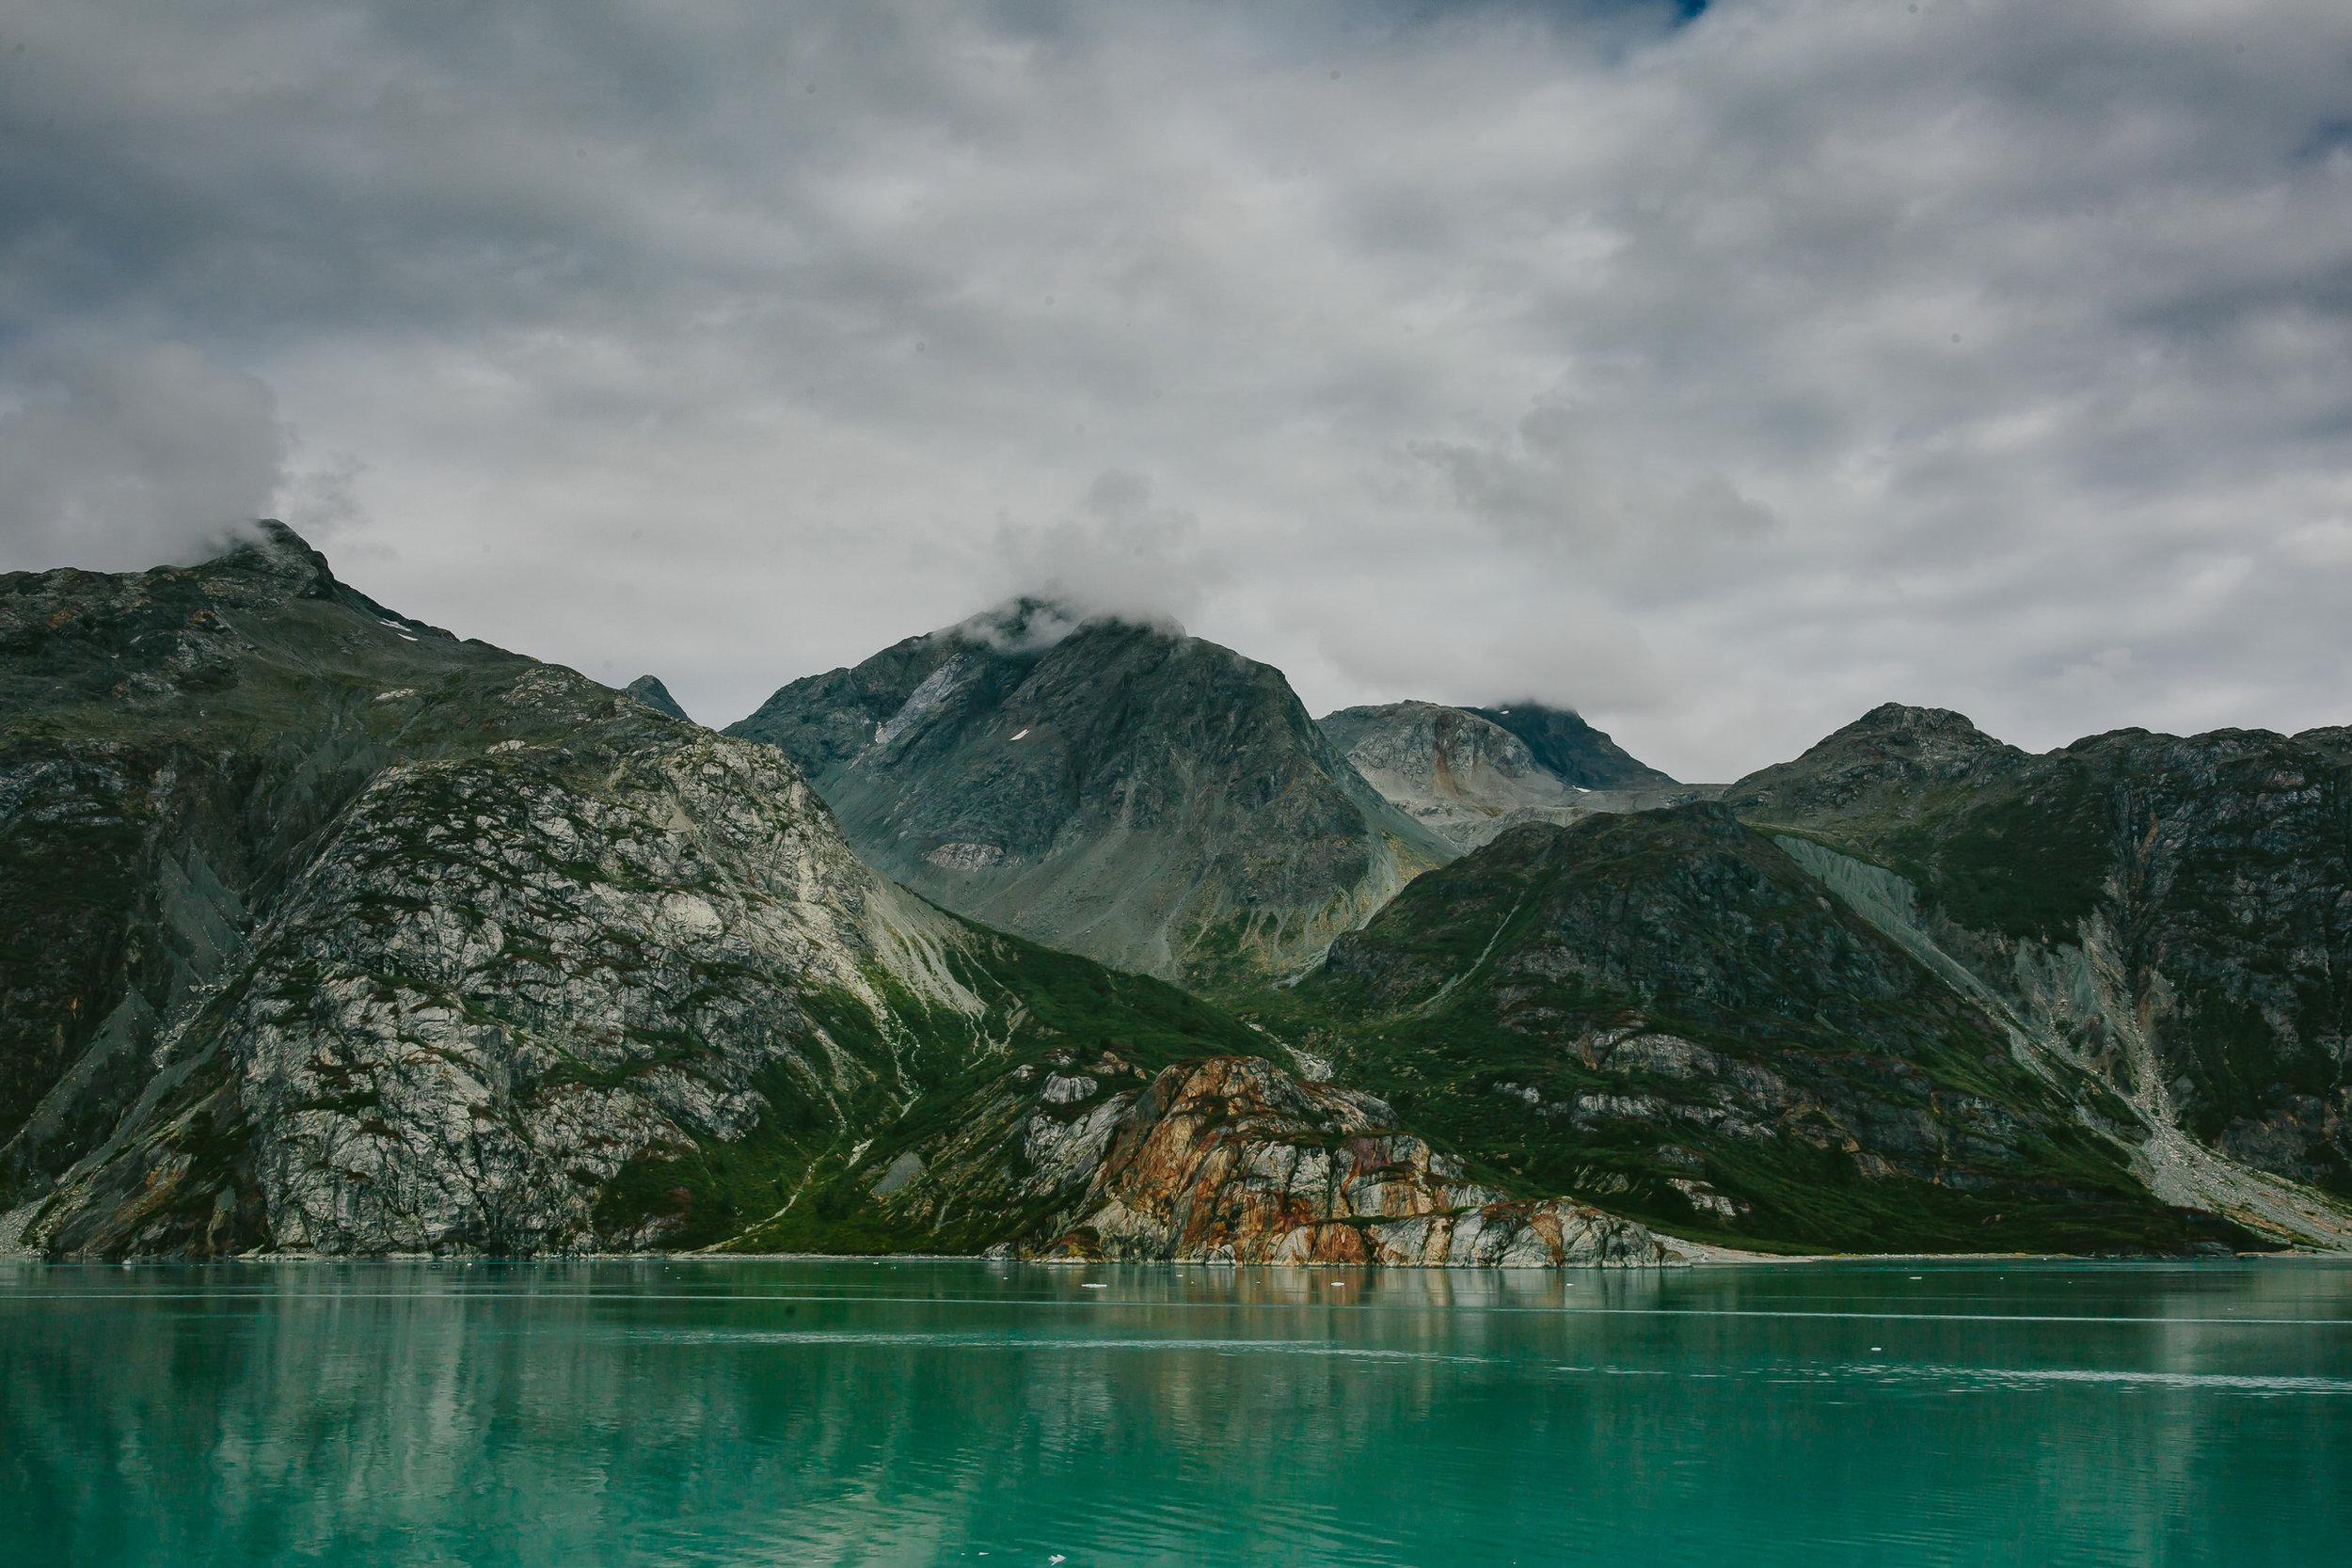 beautiful_landscapes_alaska_tiny_house_photo-1.jpg